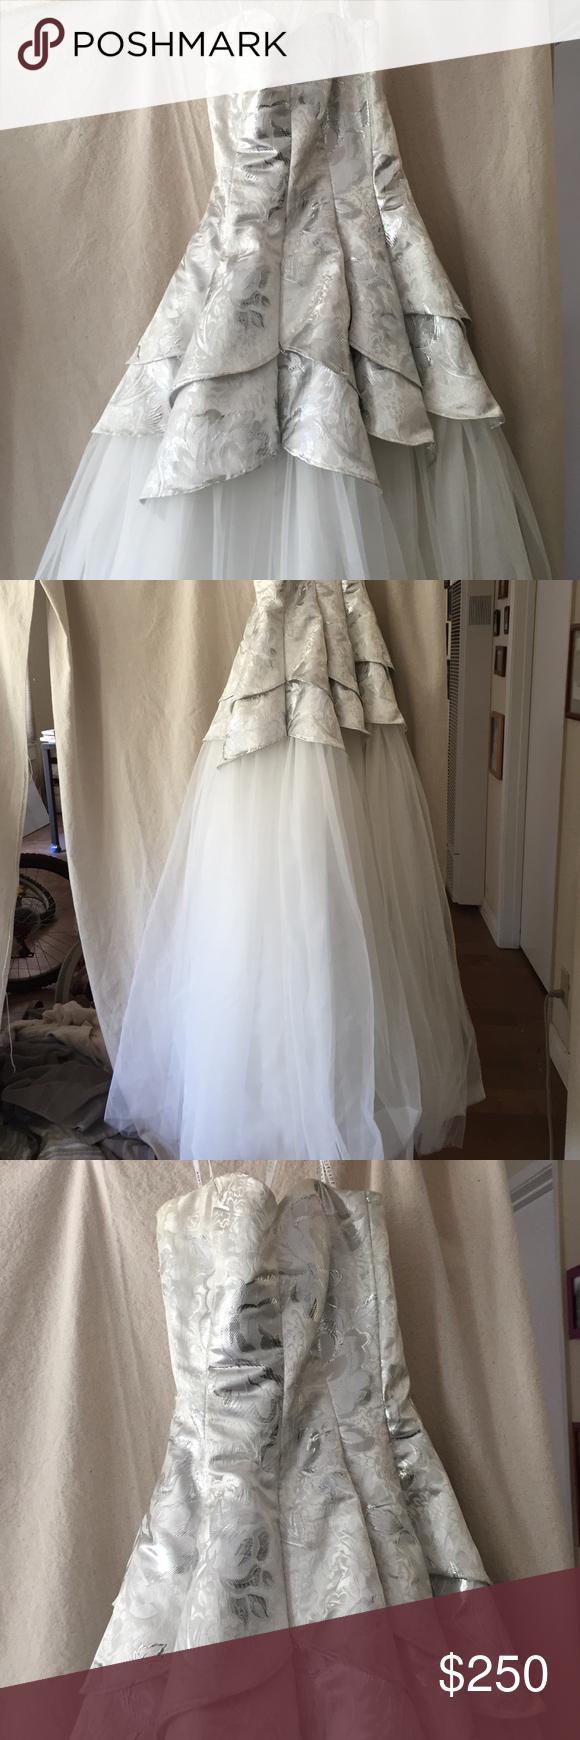 Beautiful princessprom dress princess prom dresses white skirts